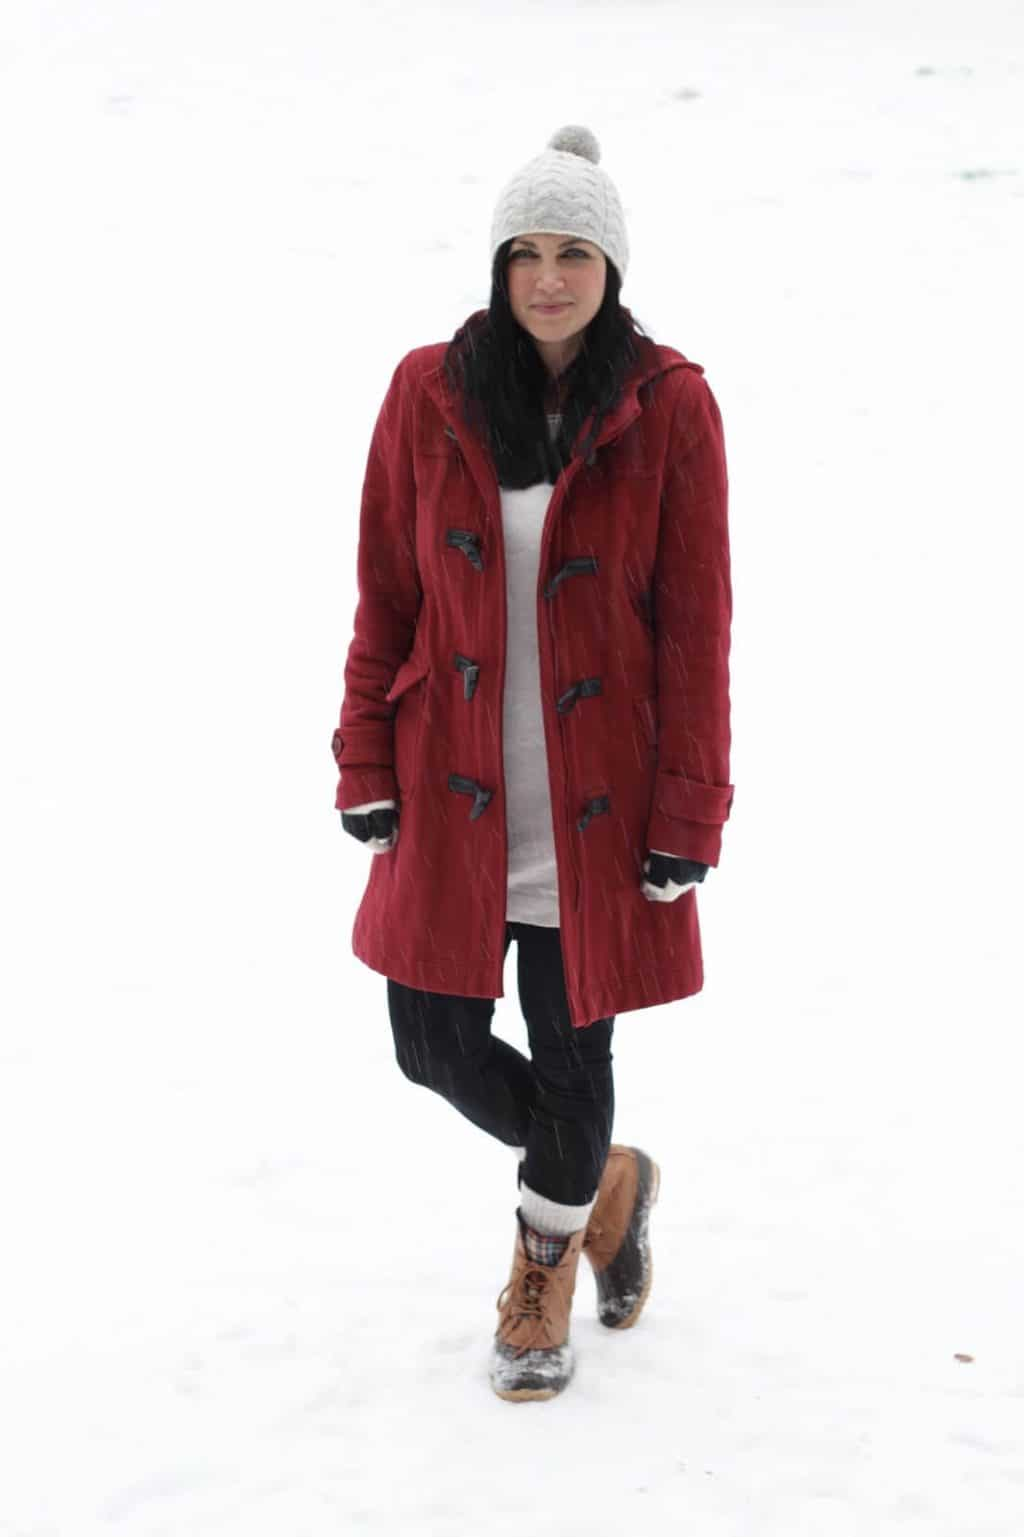 Red Winter Coat, Leggings, Snow Boots